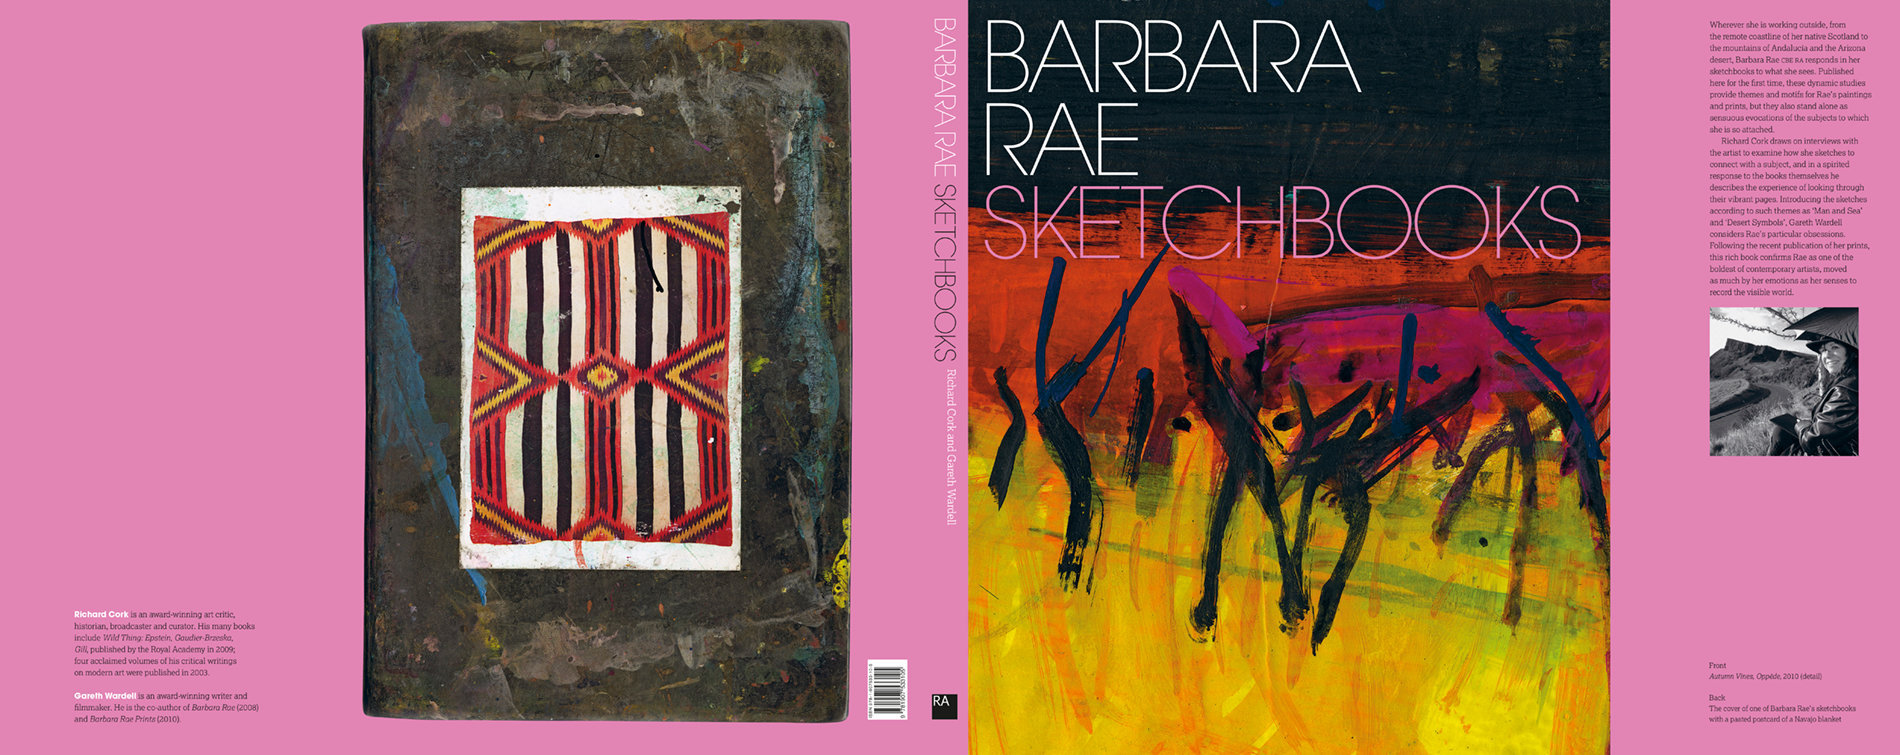 Barbara Rae - Sketchbooks